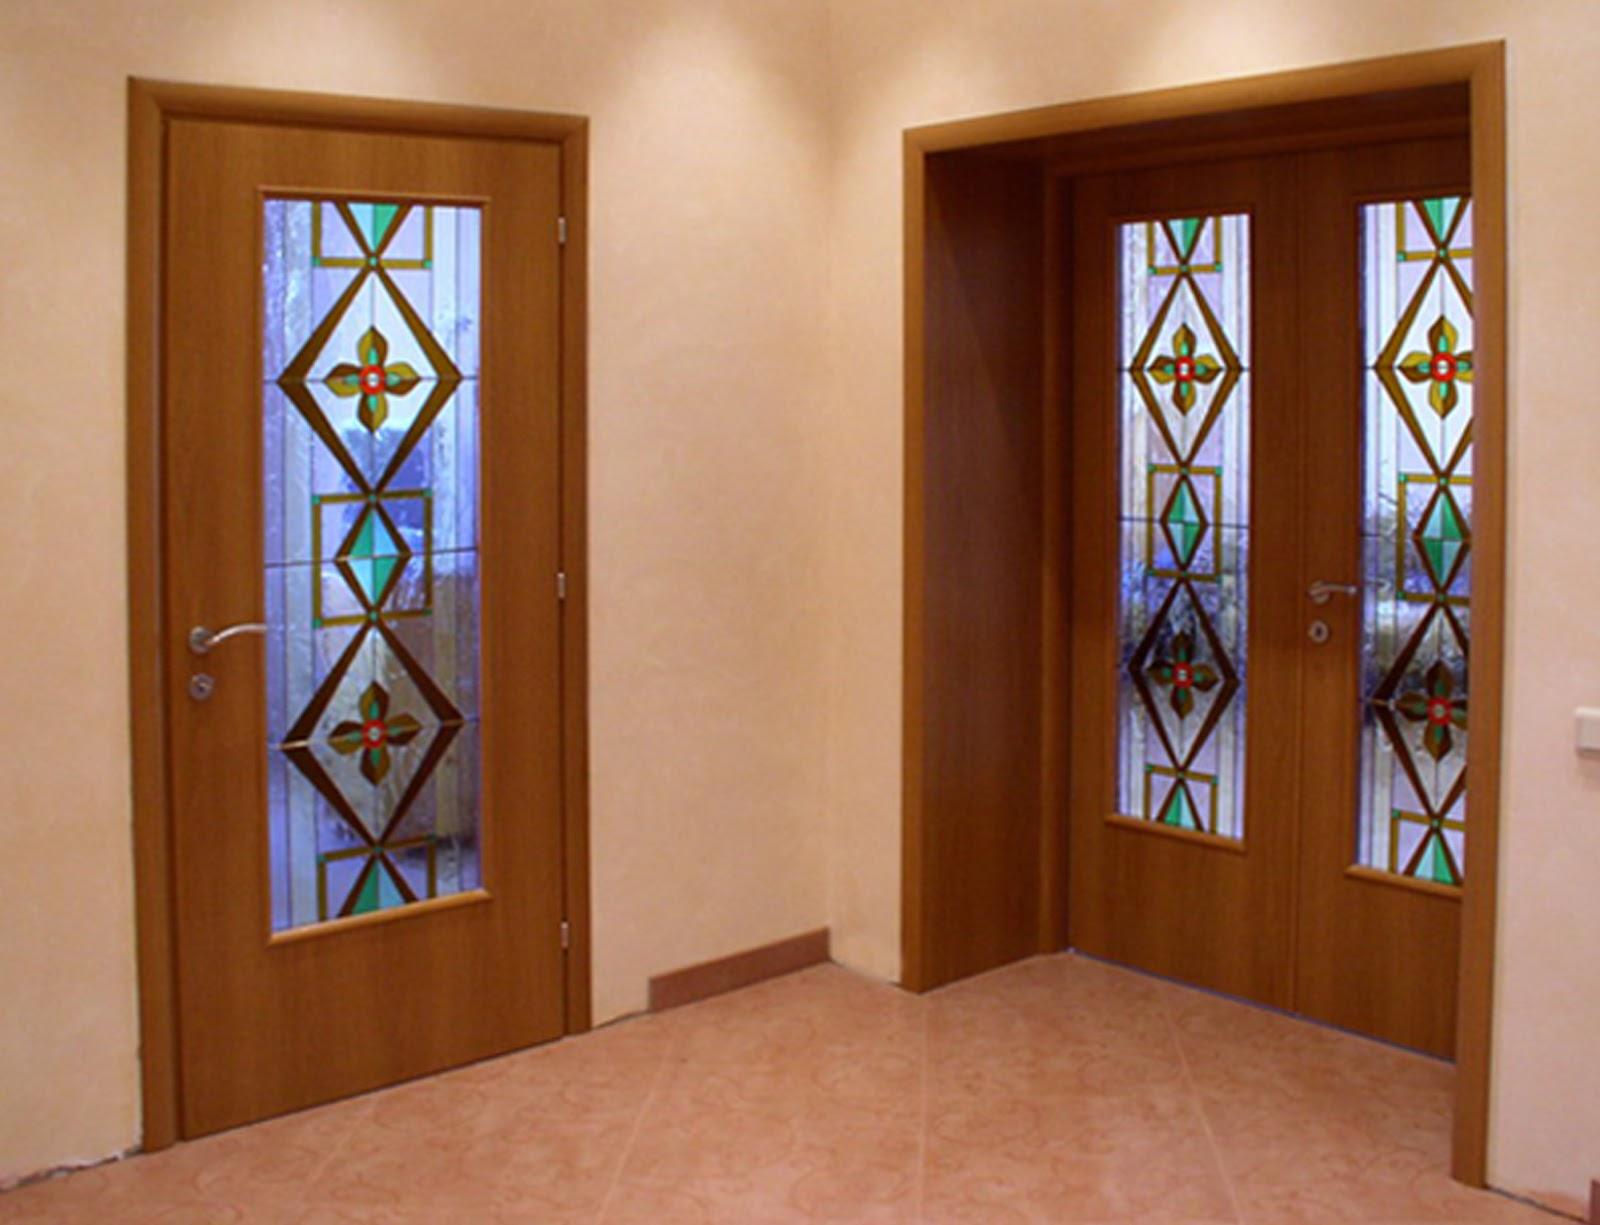 dekor-na-dveri-svoimi-rukami-kak-pravilno-sdelat-01.jpg